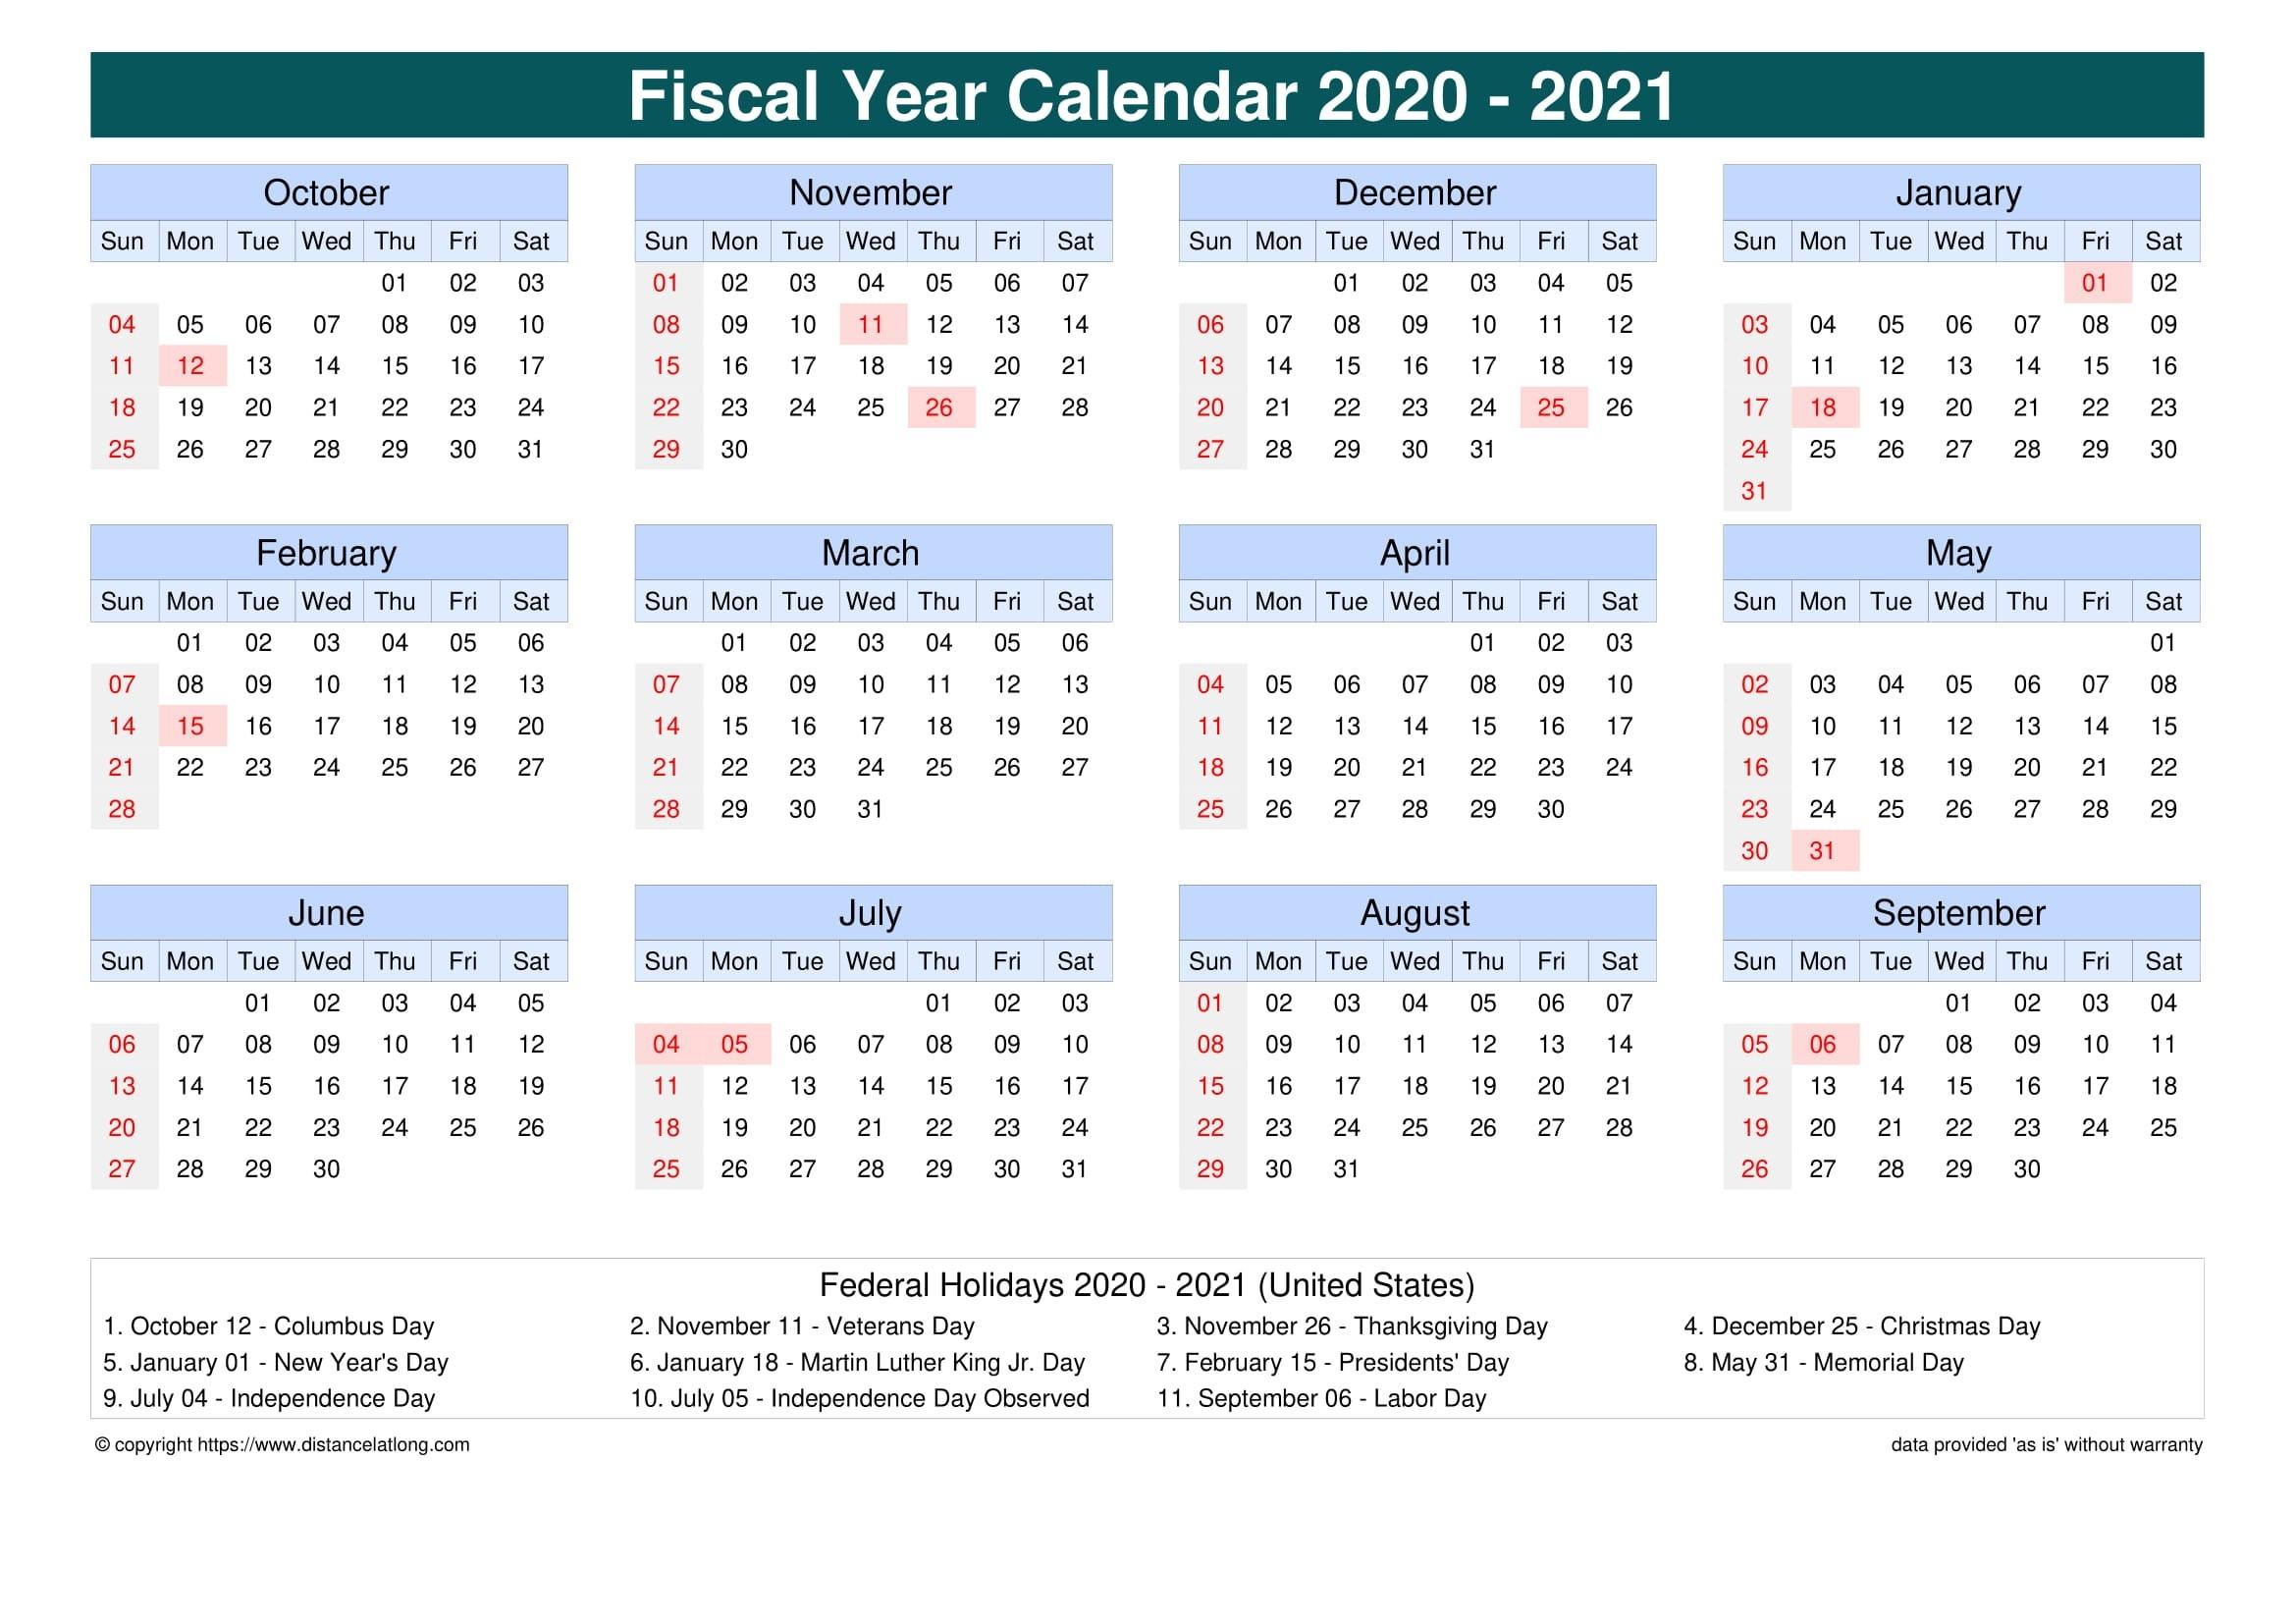 Fiscal Year 2020-2021 Calendar Templates, Free Printable  Australian Fiscal Year 2021